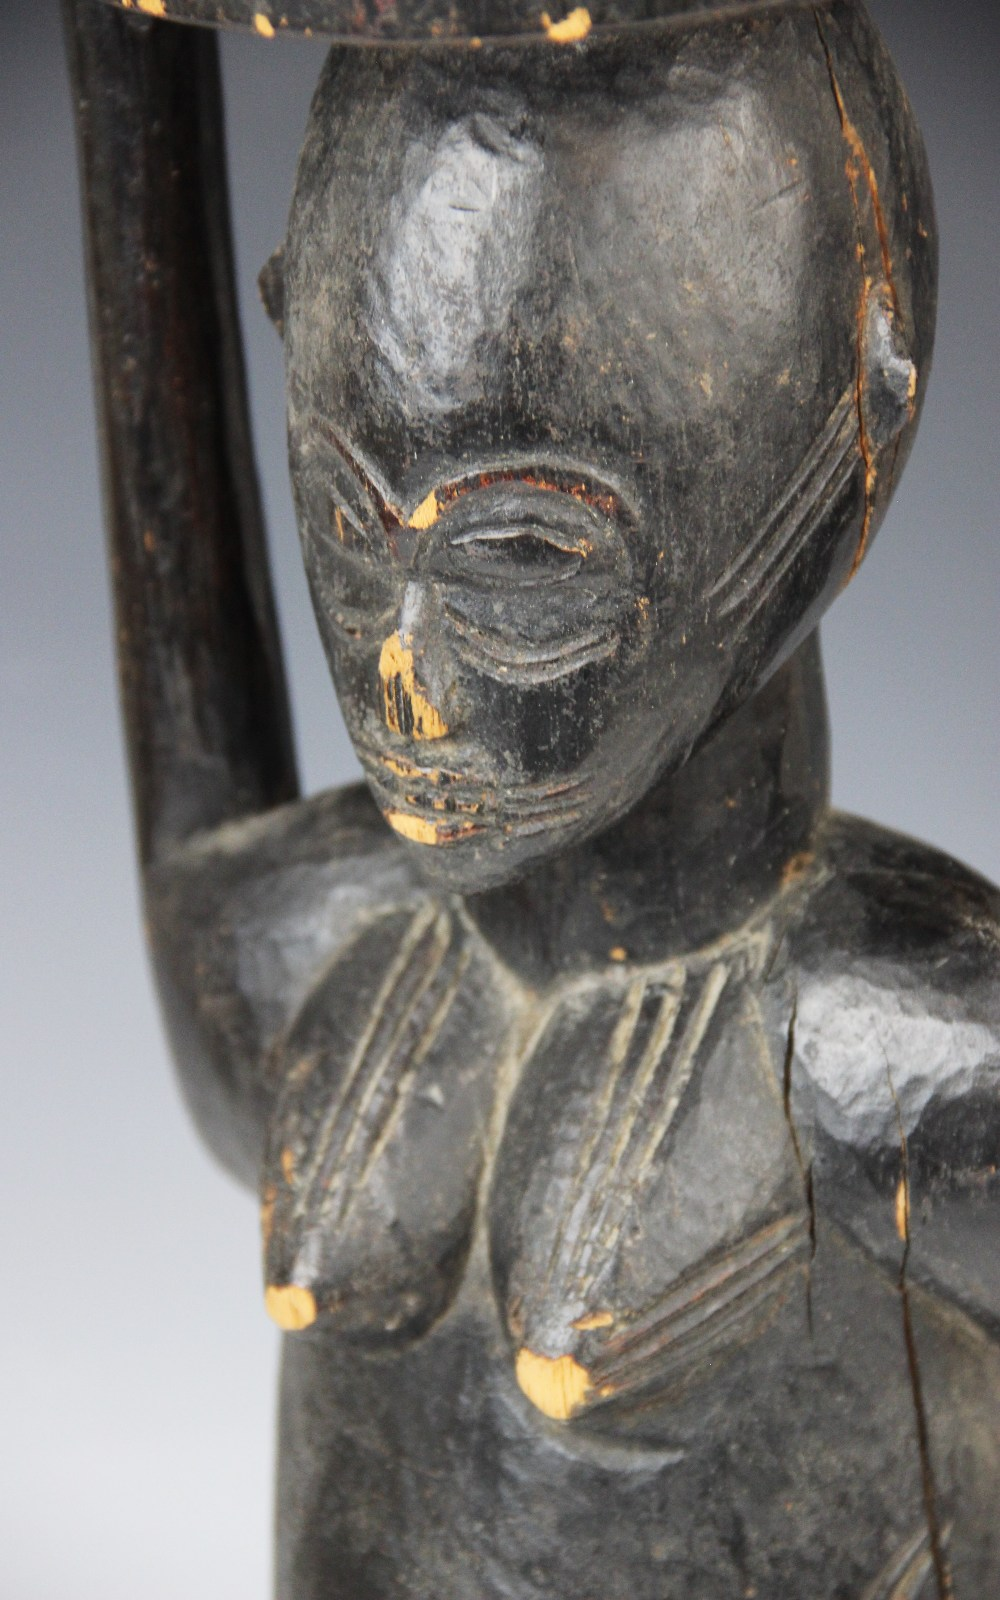 A large West African Senufo Ivory Coast female figure, 56cm high - Image 2 of 4